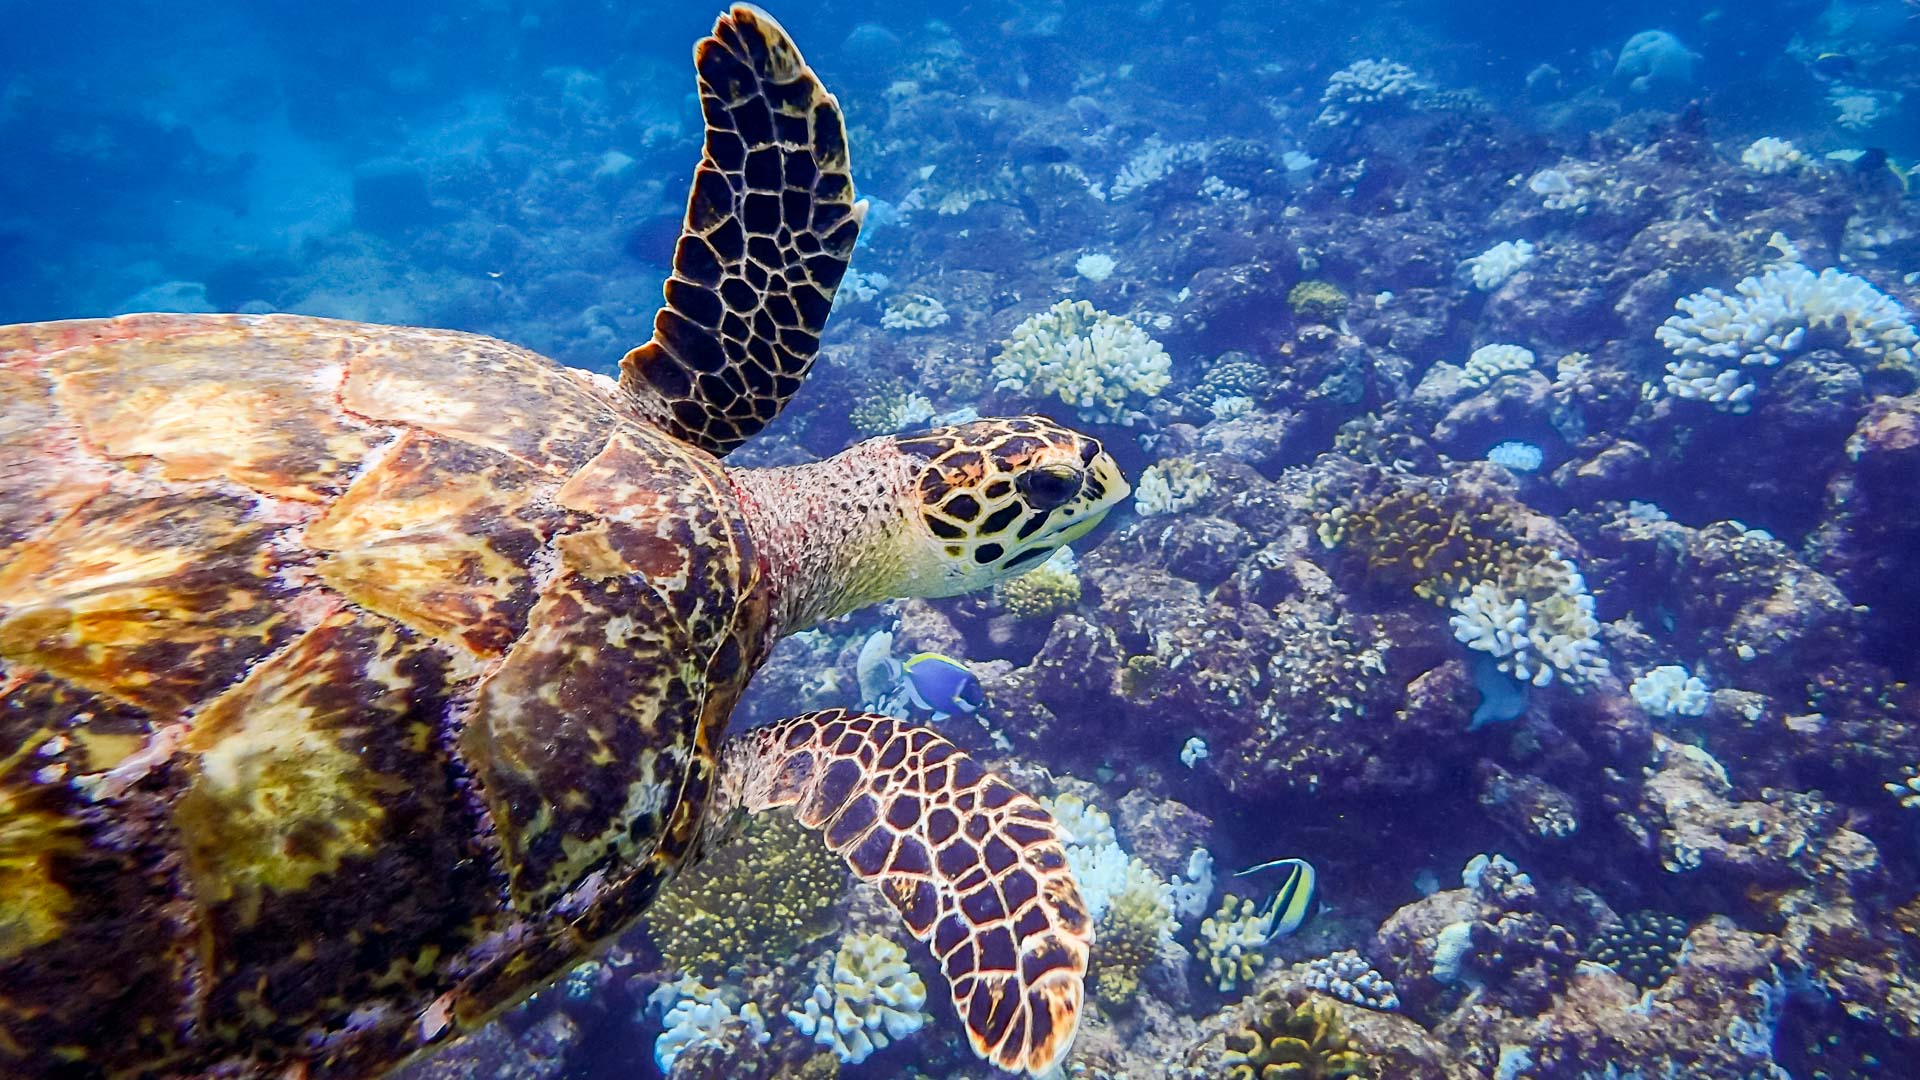 MSTIP - wild Hawksbill on the reef, Marine Savers Maldives